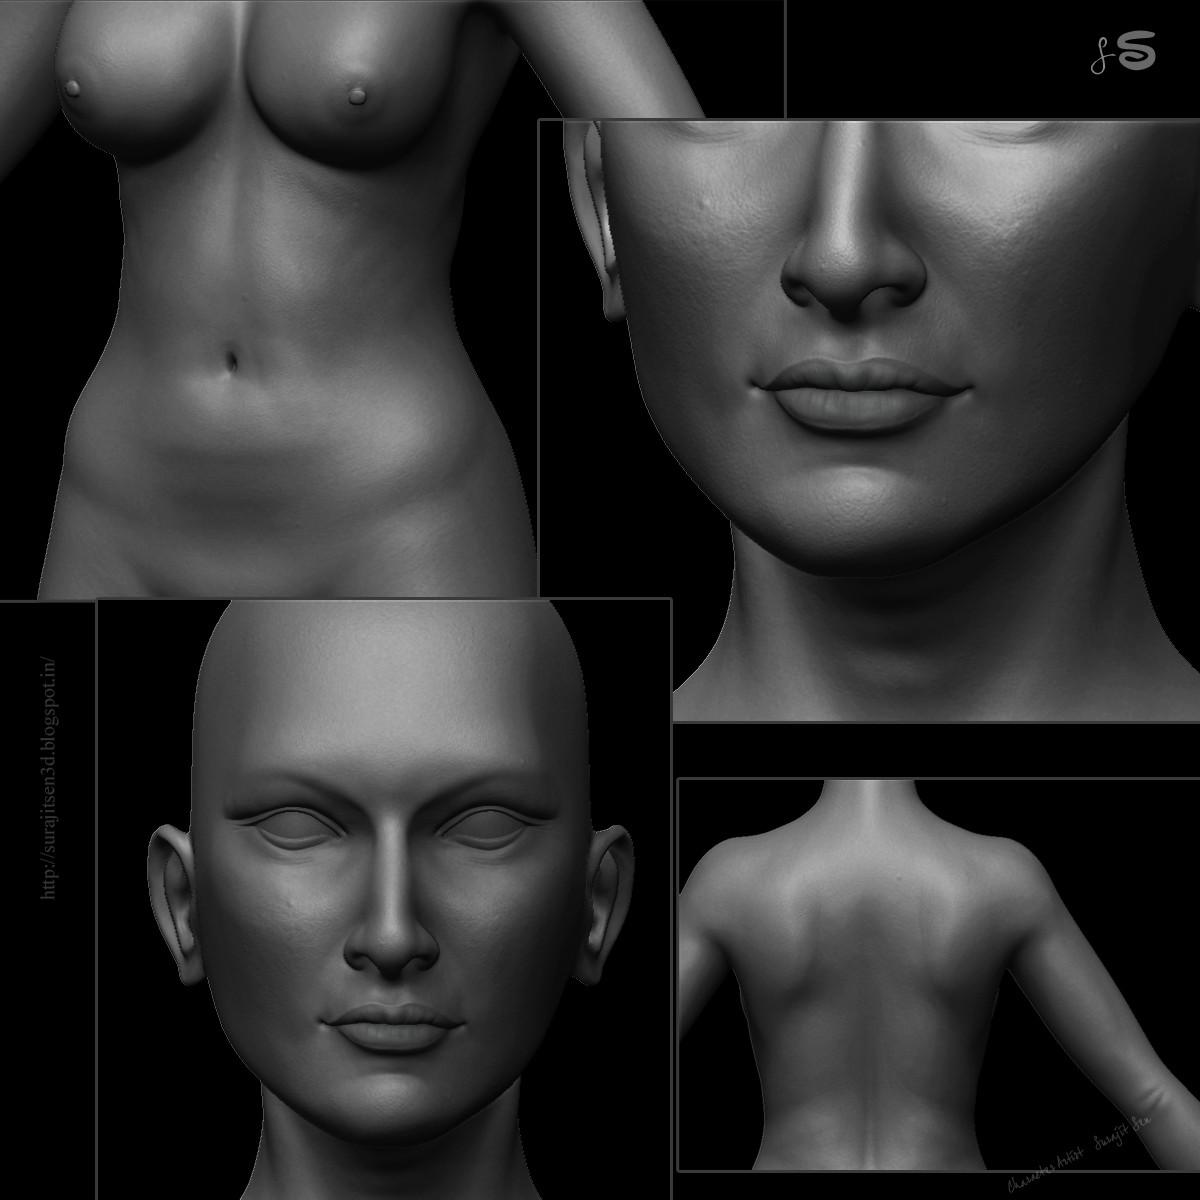 Surajit sen 9 female sculpt wip surajitsen 13102017